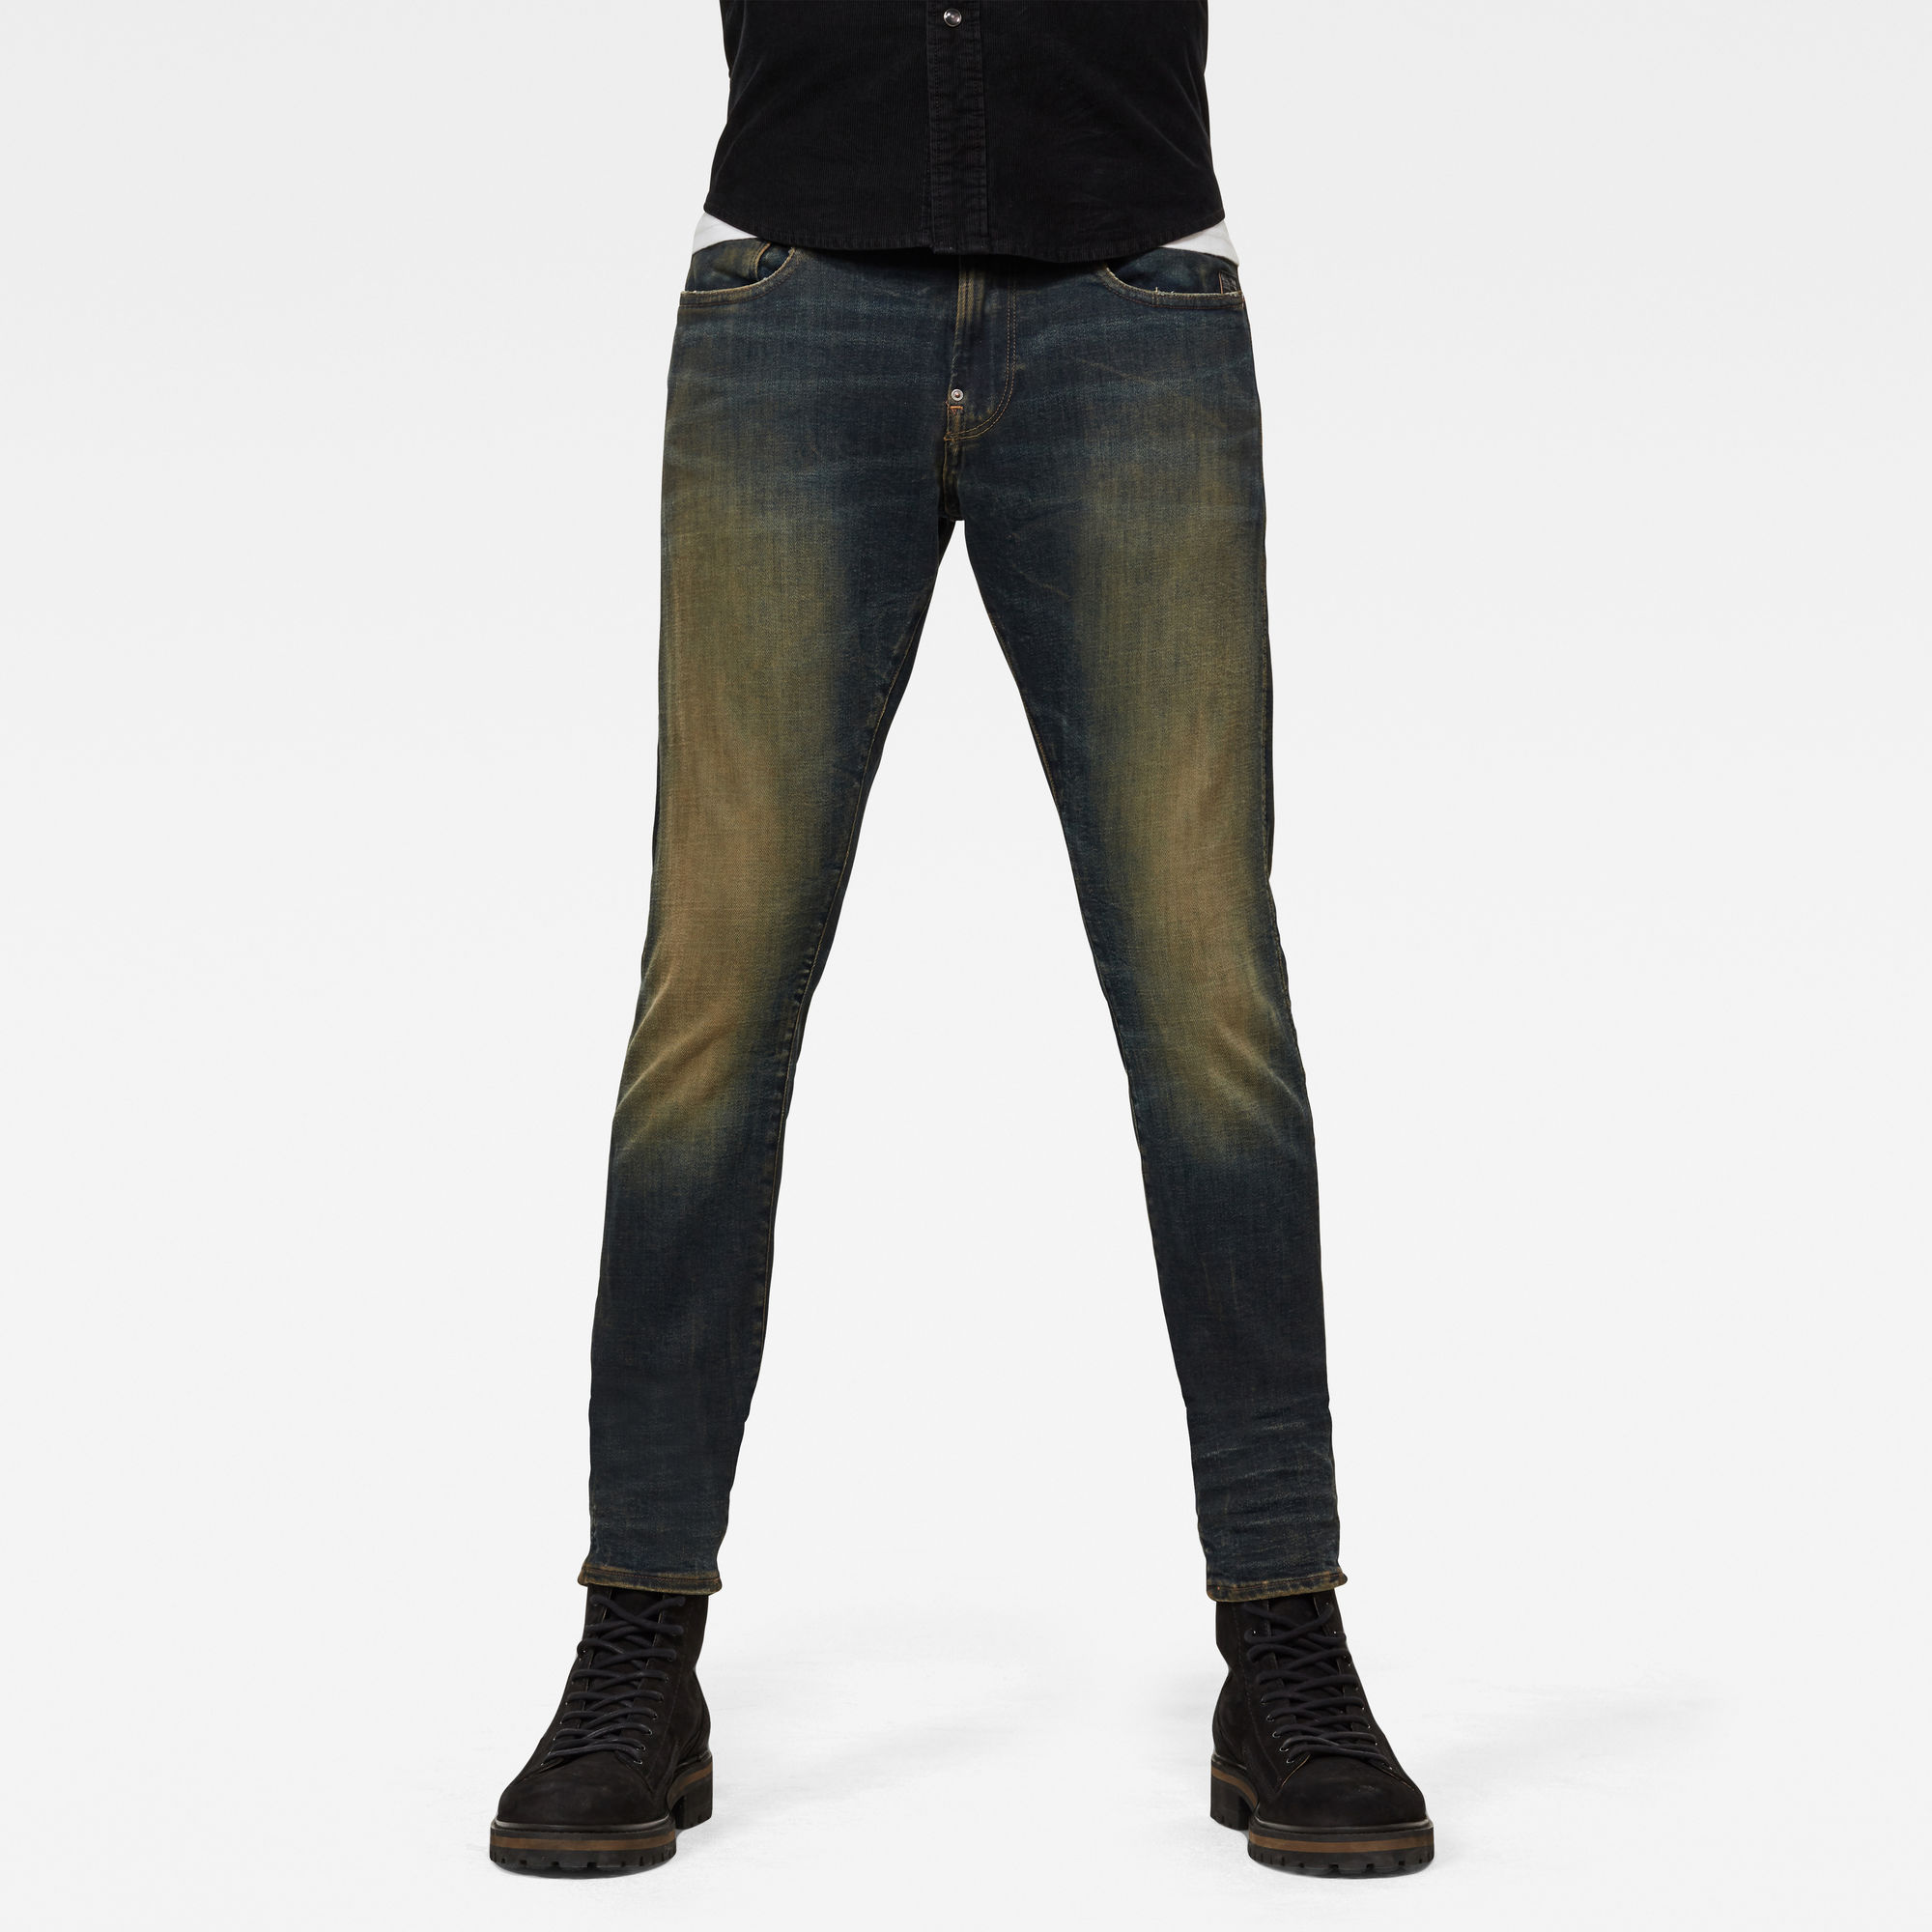 G-Star RAW Heren Revend Skinny Jeans Donkerblauw